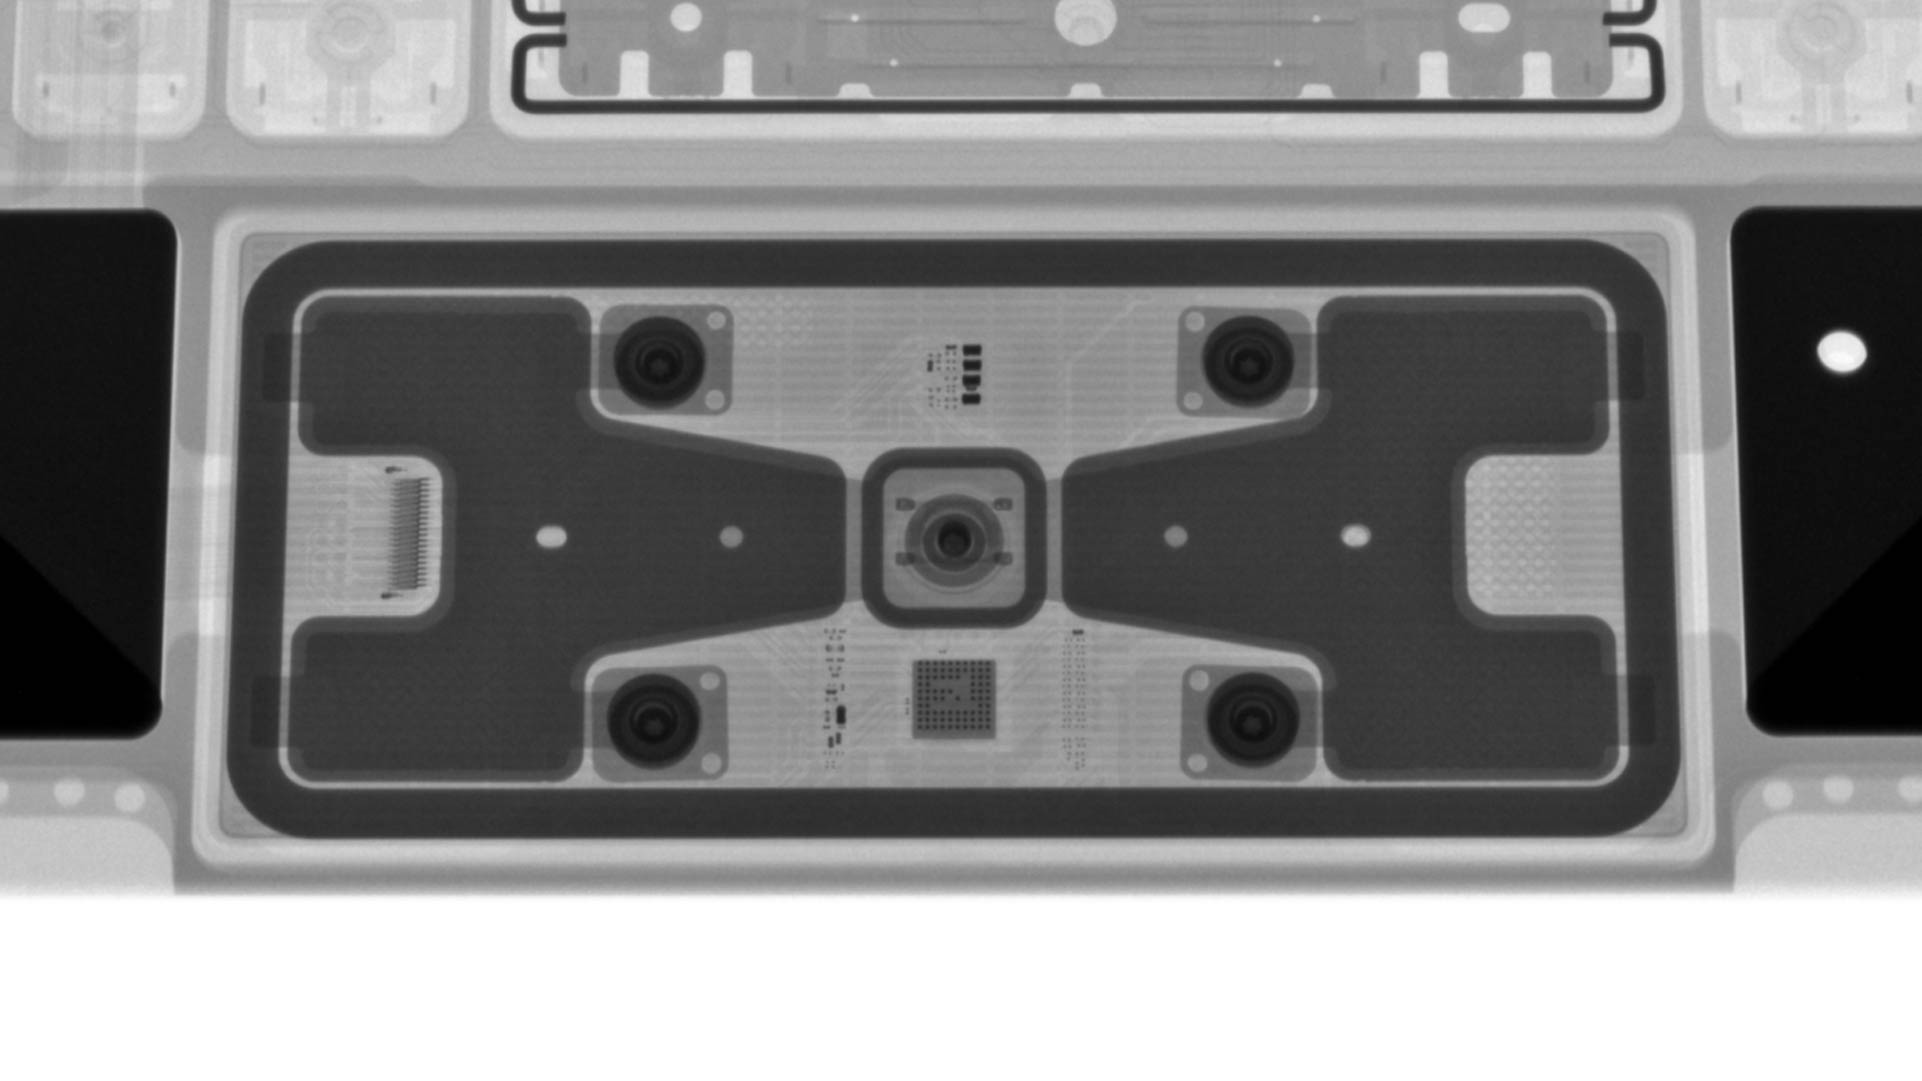 Magic Keyboard iPad Pro iFixit X-rays